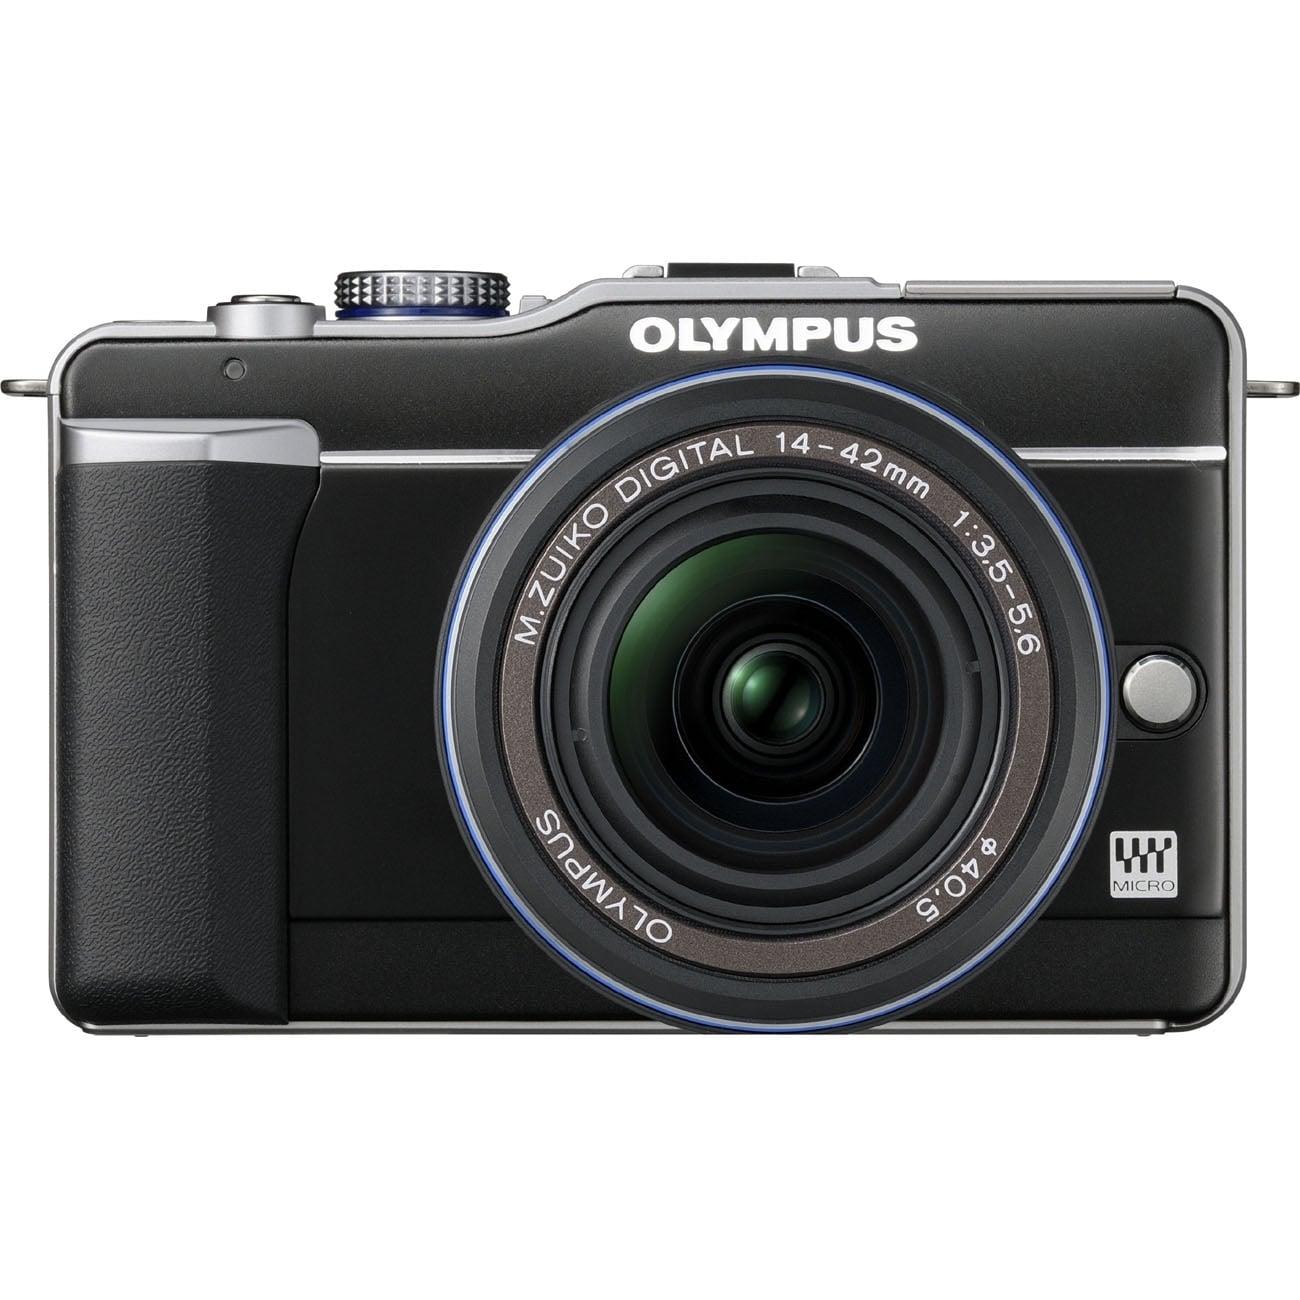 Olympus PEN E-PL1 12.3 Megapixel Mirrorless Camera Body O...